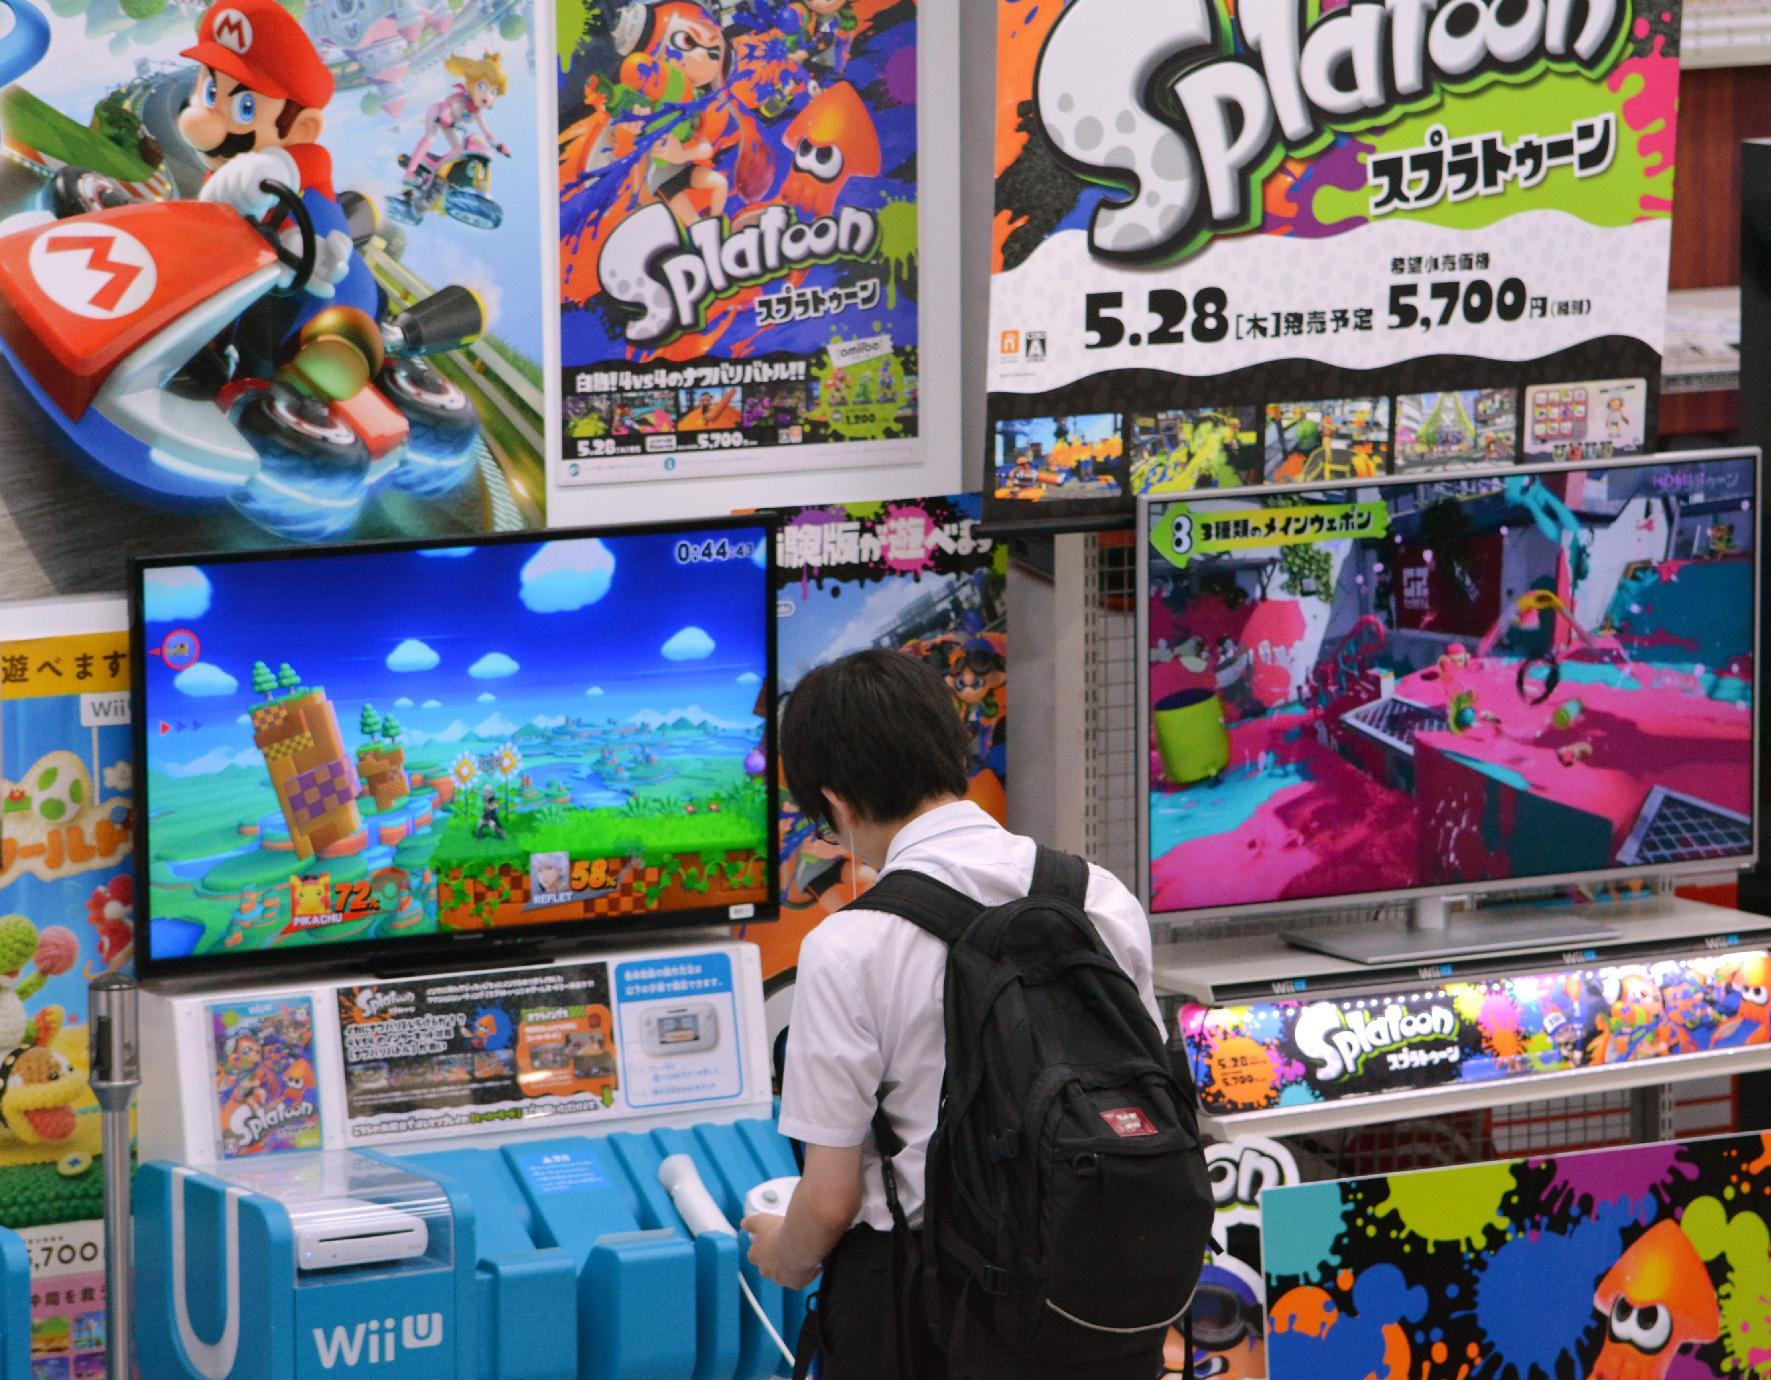 Nintendo NX console gets launch date, 'Zelda' delayed